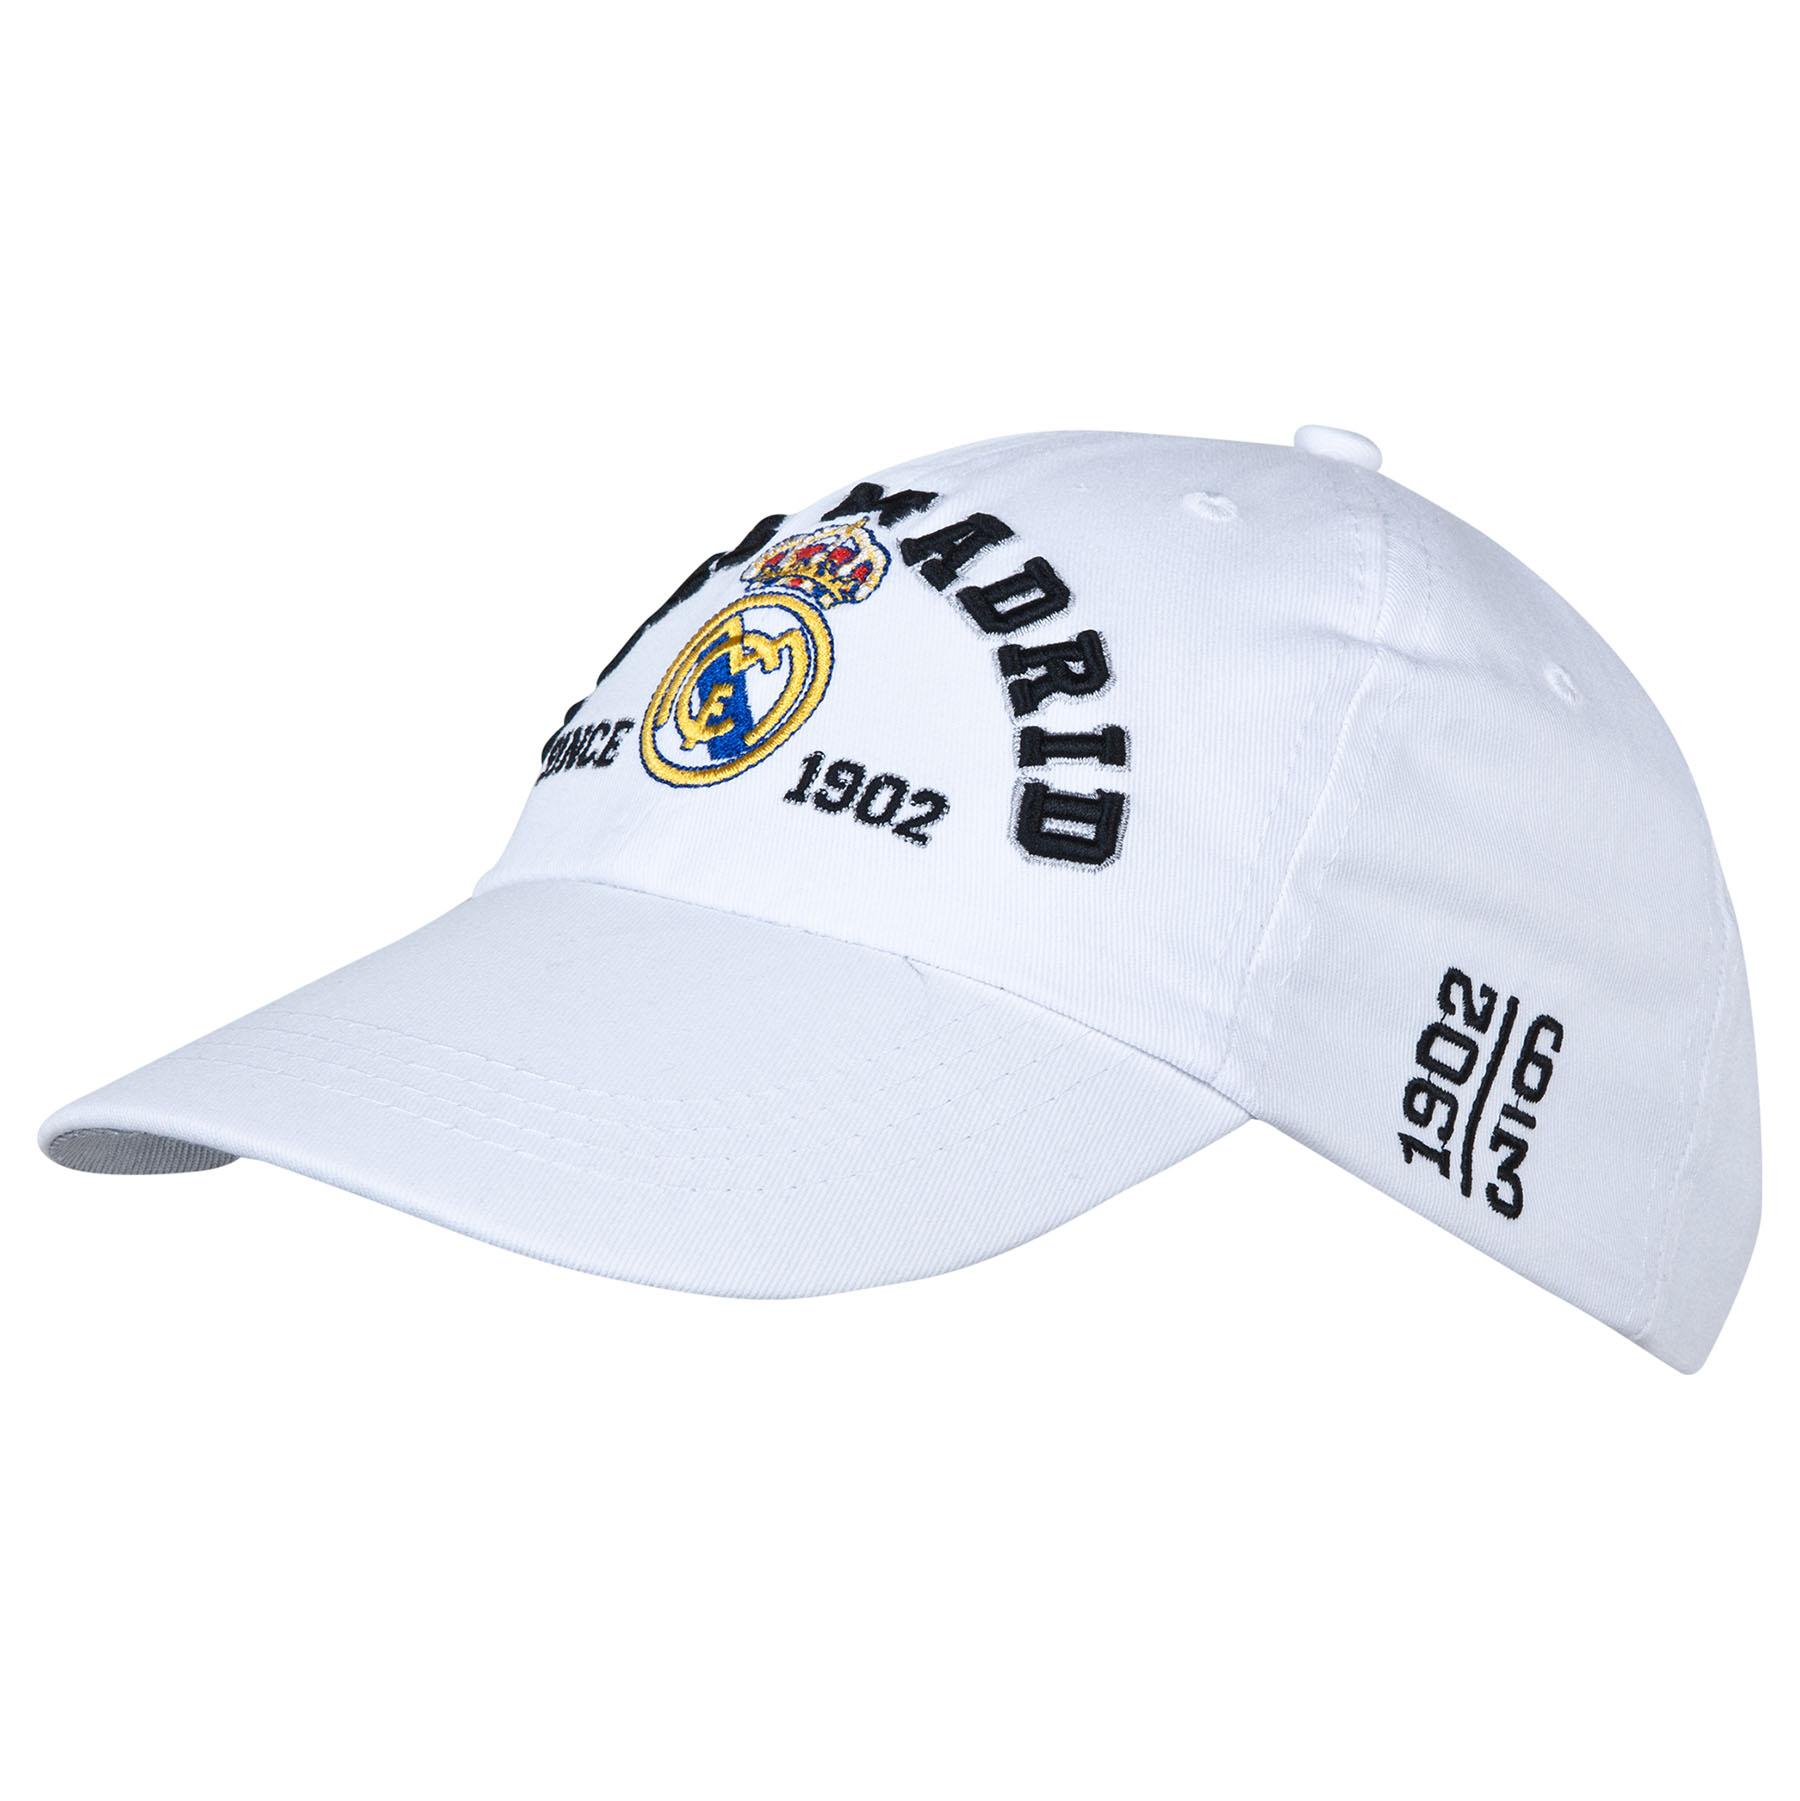 Real Madrid Crest Cap - White - Adult